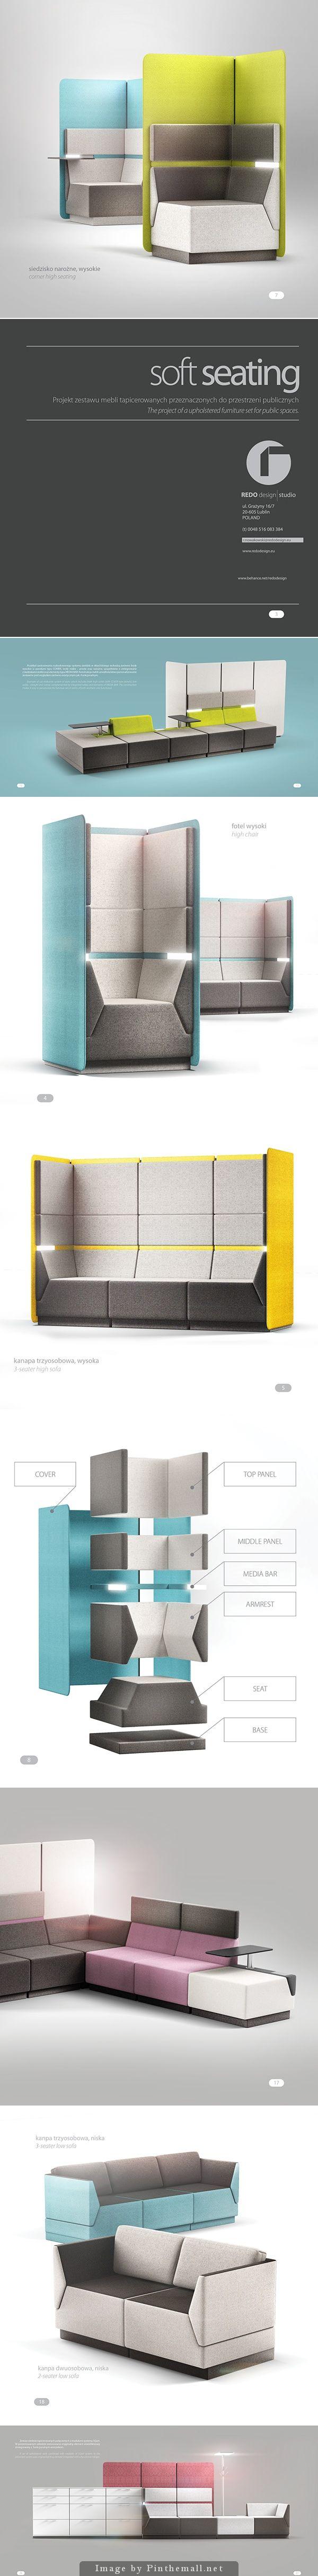 COVER soft seating system | Designer: REDO Design Studio